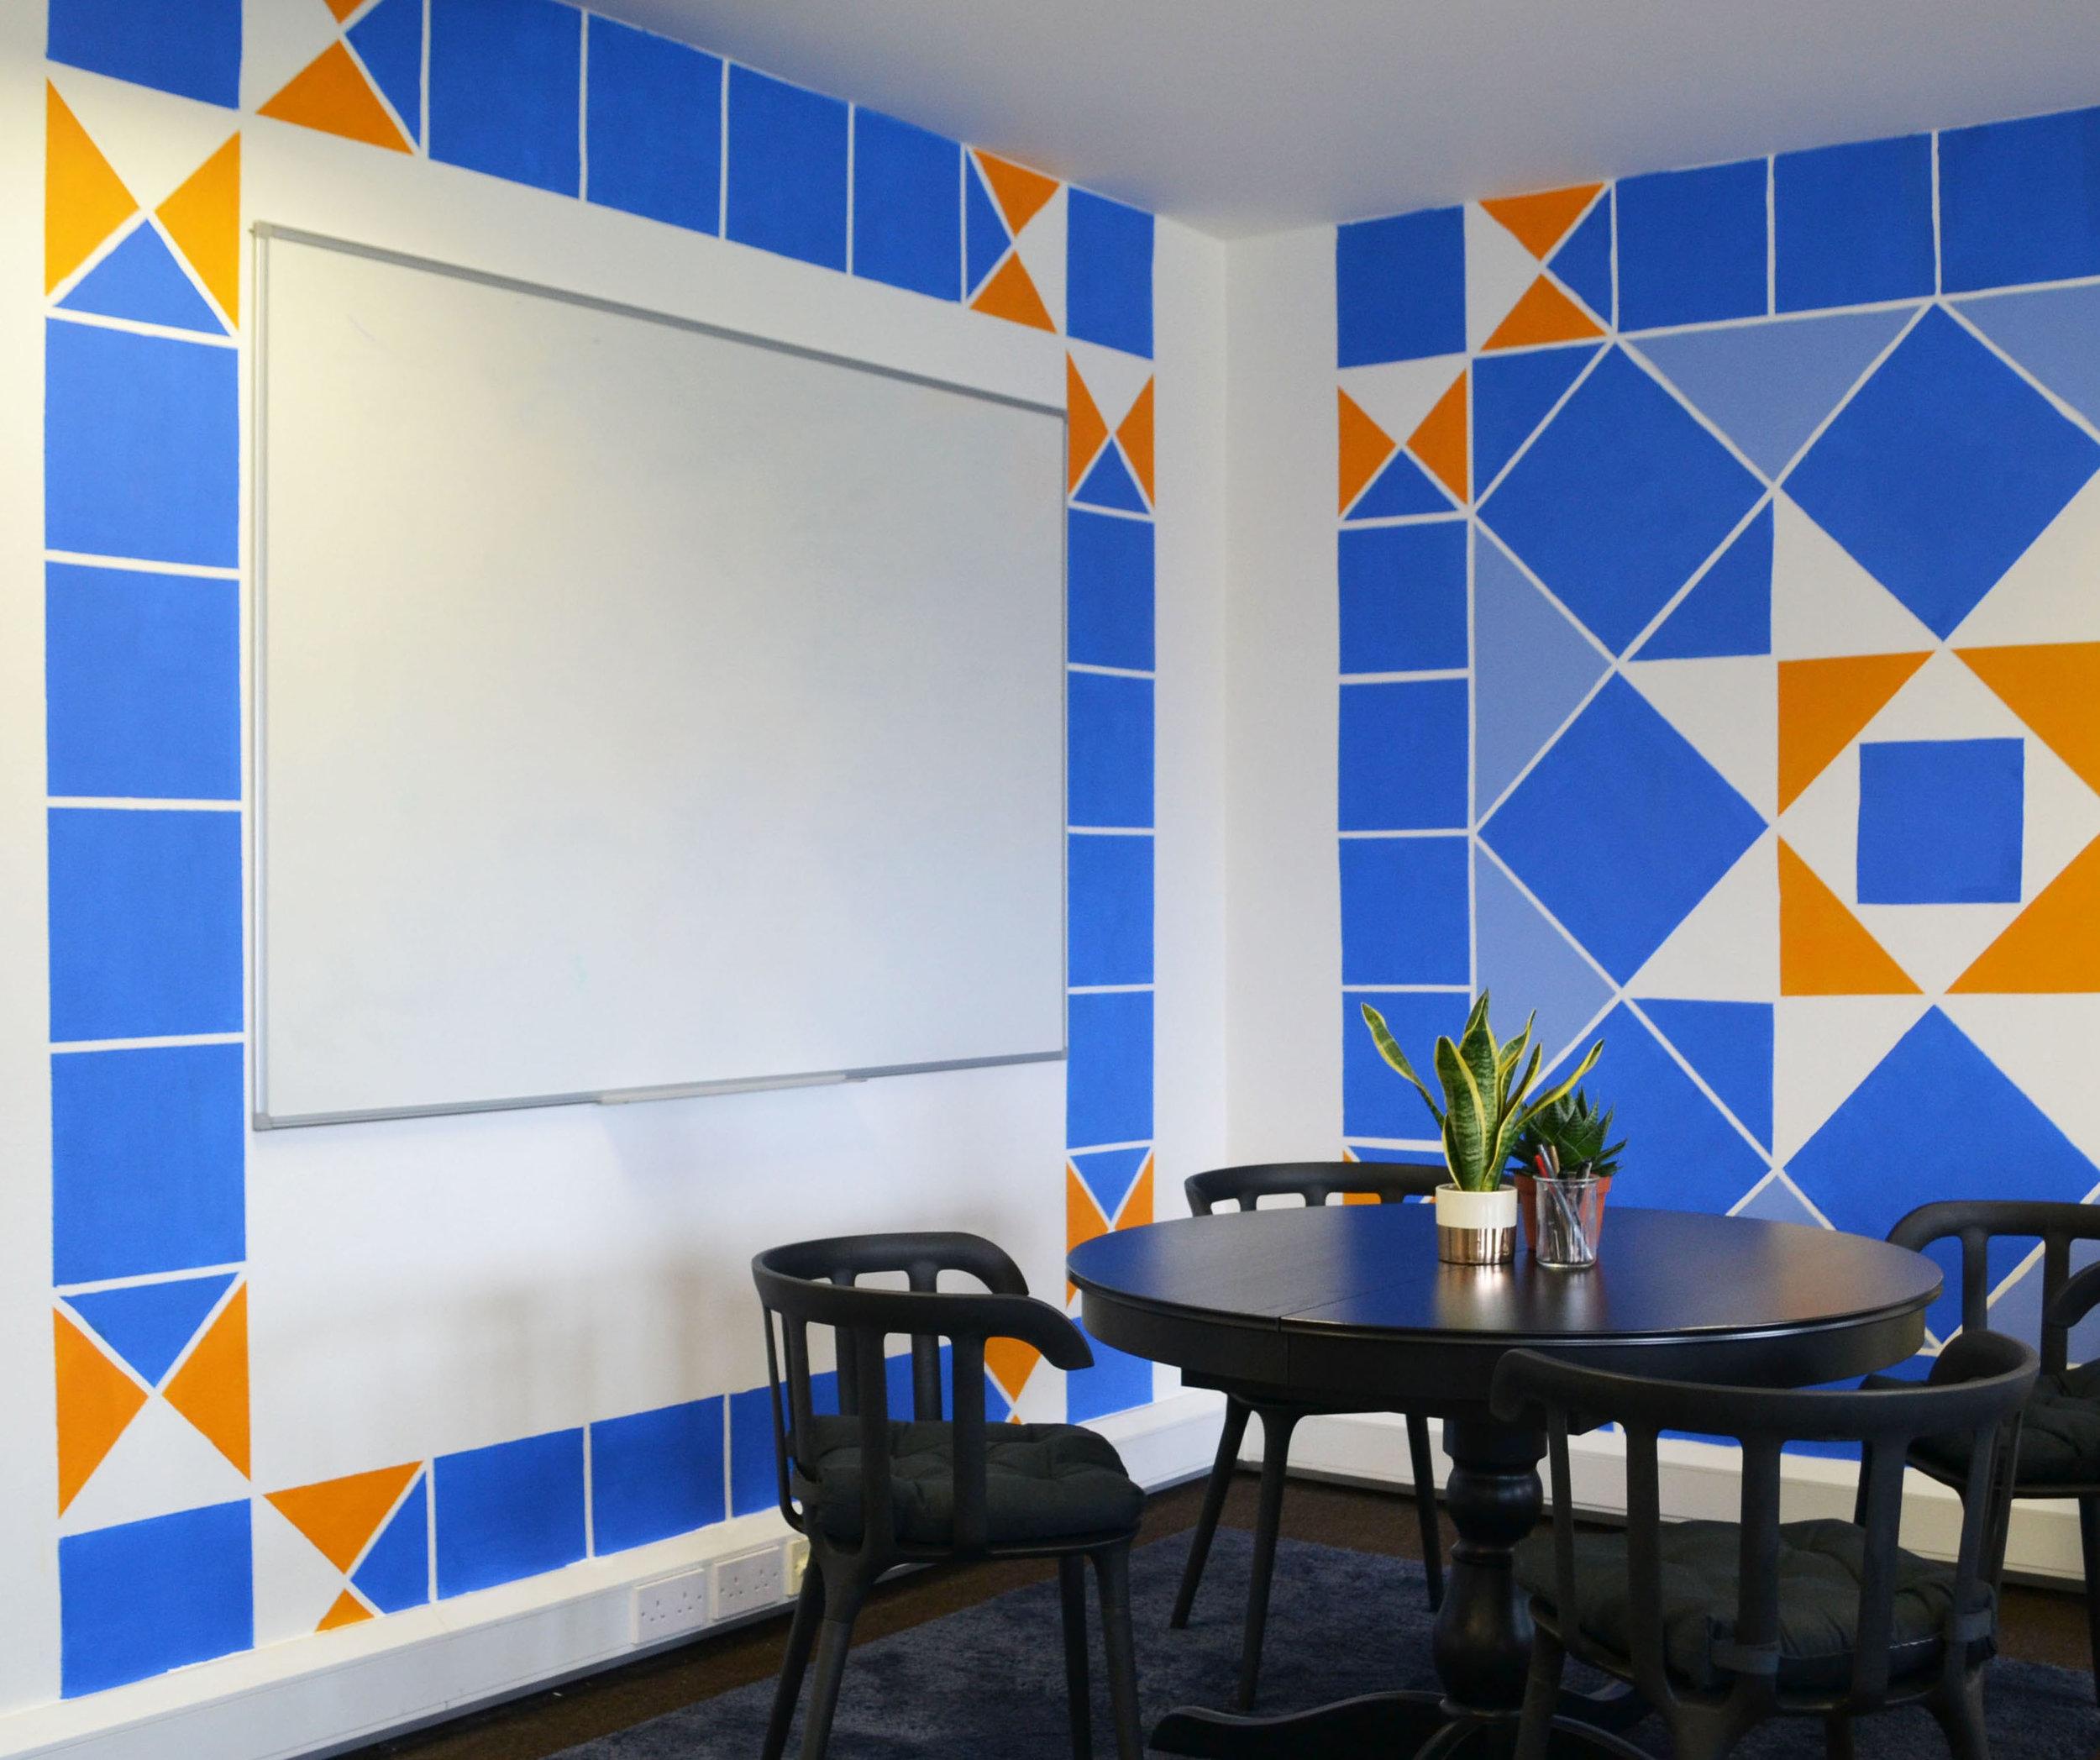 Victorian Tile Mural, Spacey Studio, Interior Design.